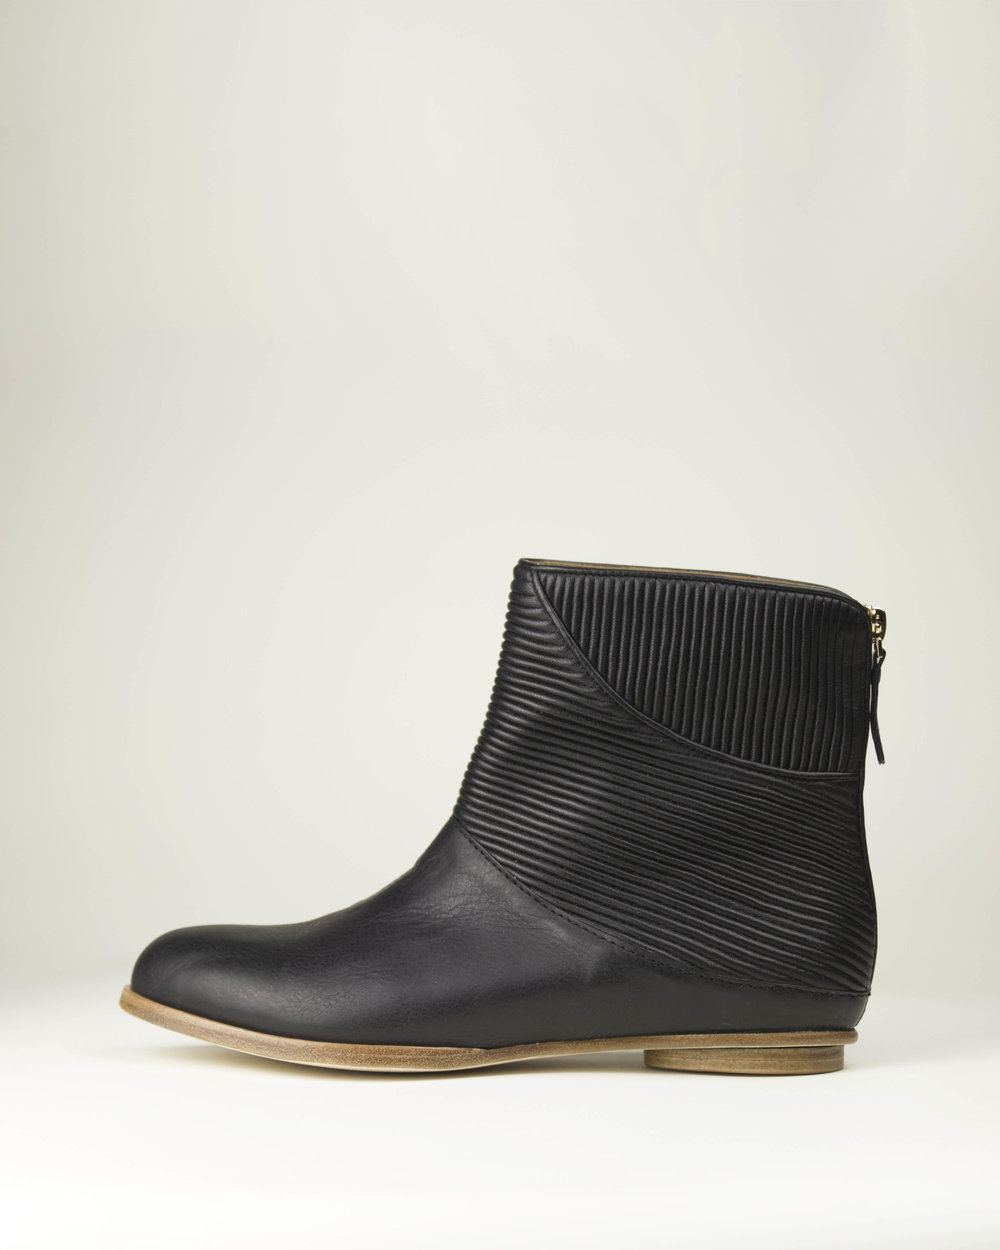 Boot 1200.jpg